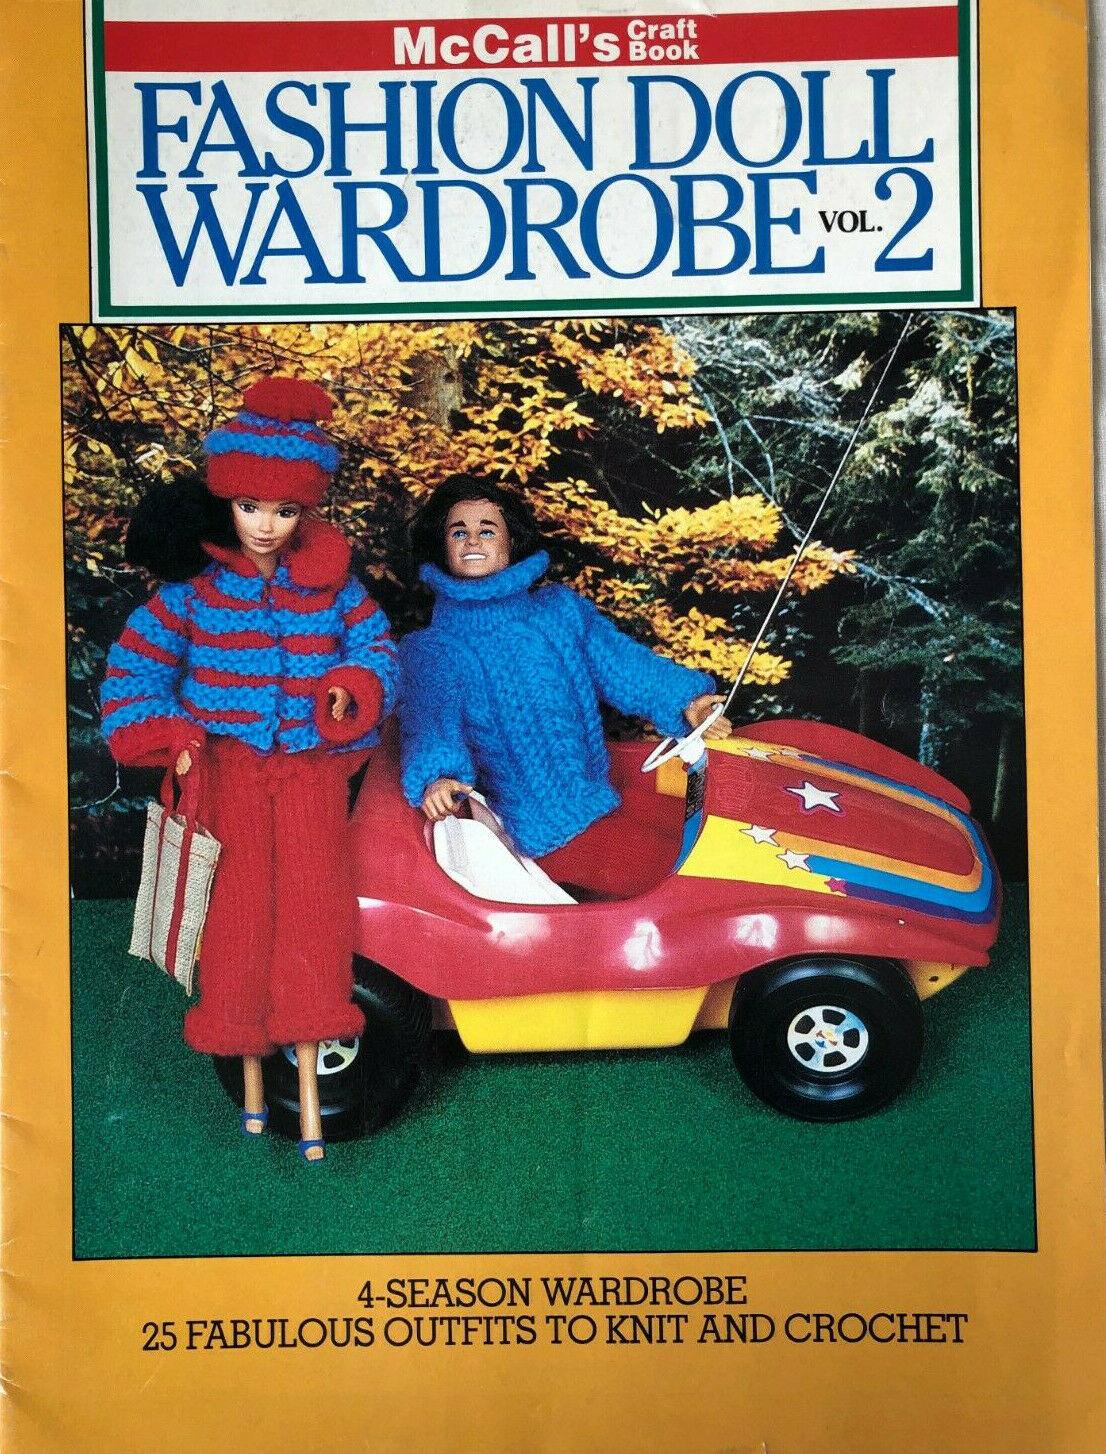 1982 Fashion Barbie Doll Wardrobe Vol 2 McCall's Knit & Crochet Book 25 Outfits - $19.95